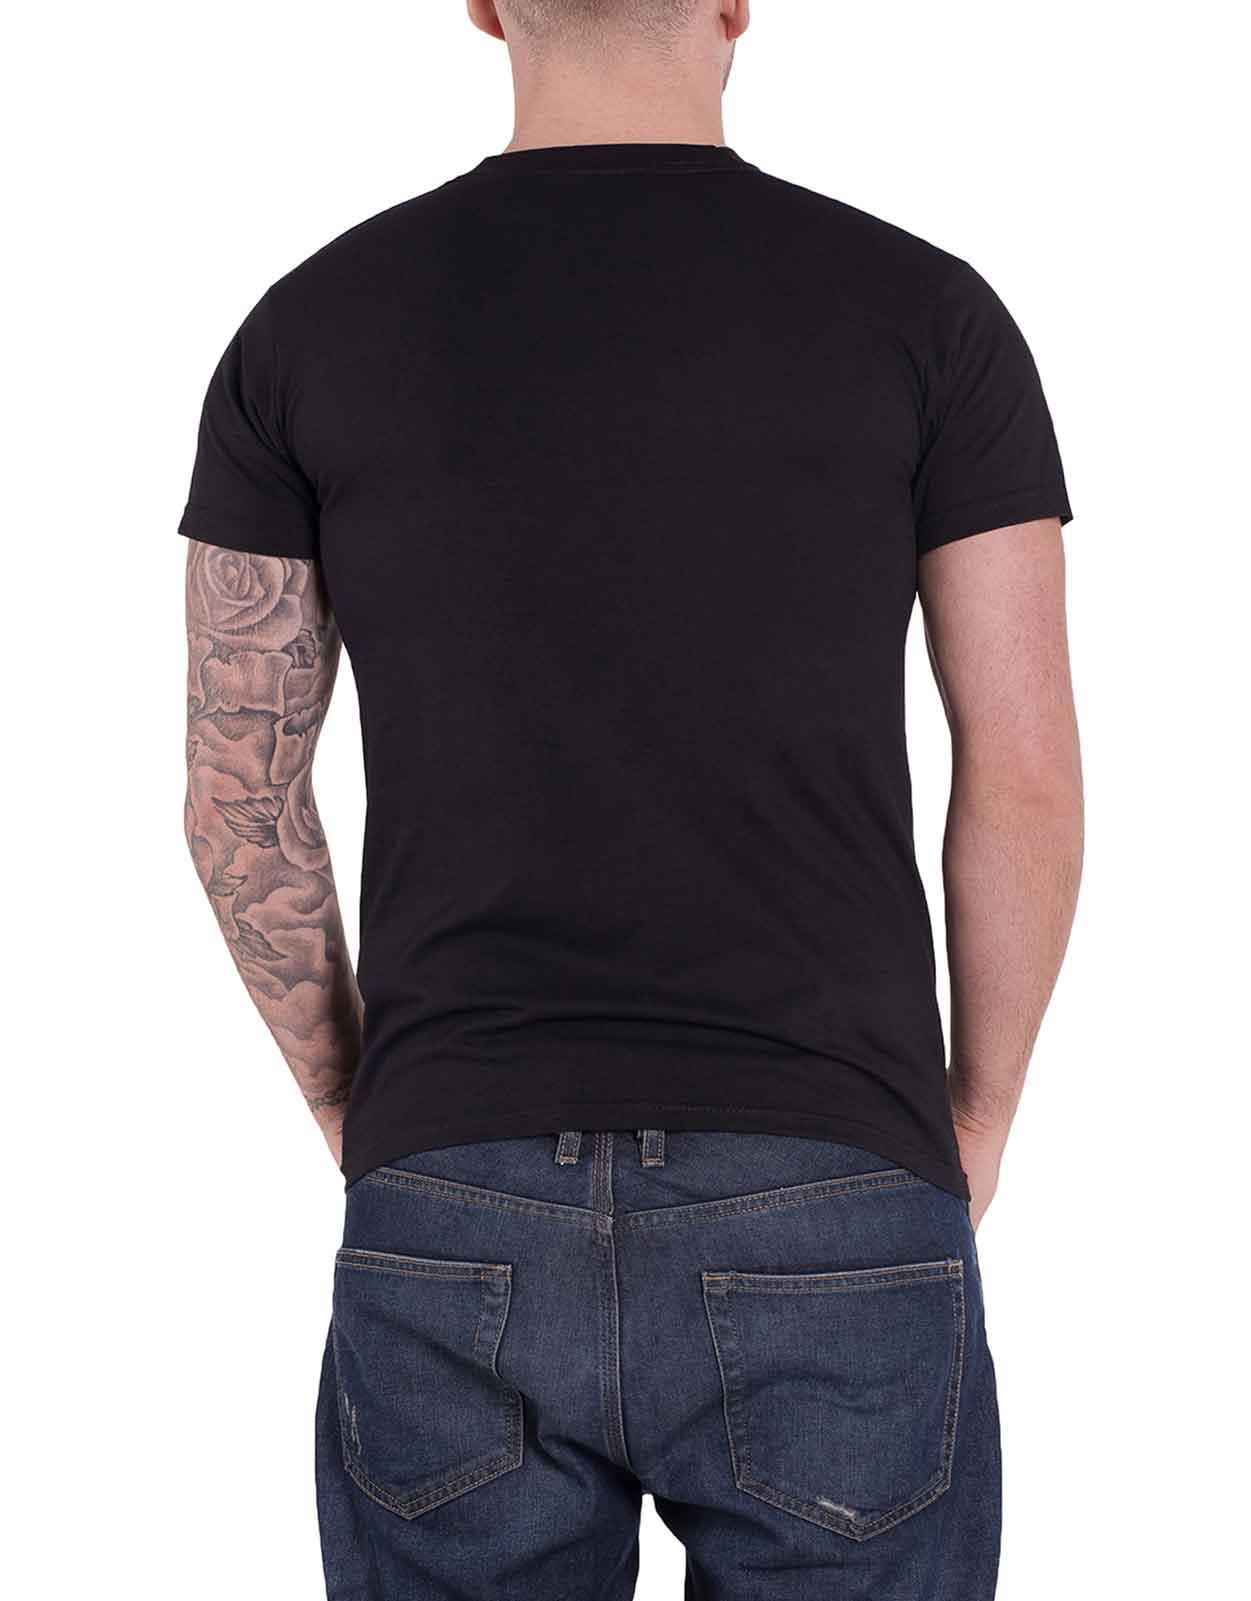 Official-Motley-Crue-T-Shirt-Shout-at-the-Devil-The-Dirt-Tour-Band-Logo-Mens thumbnail 48